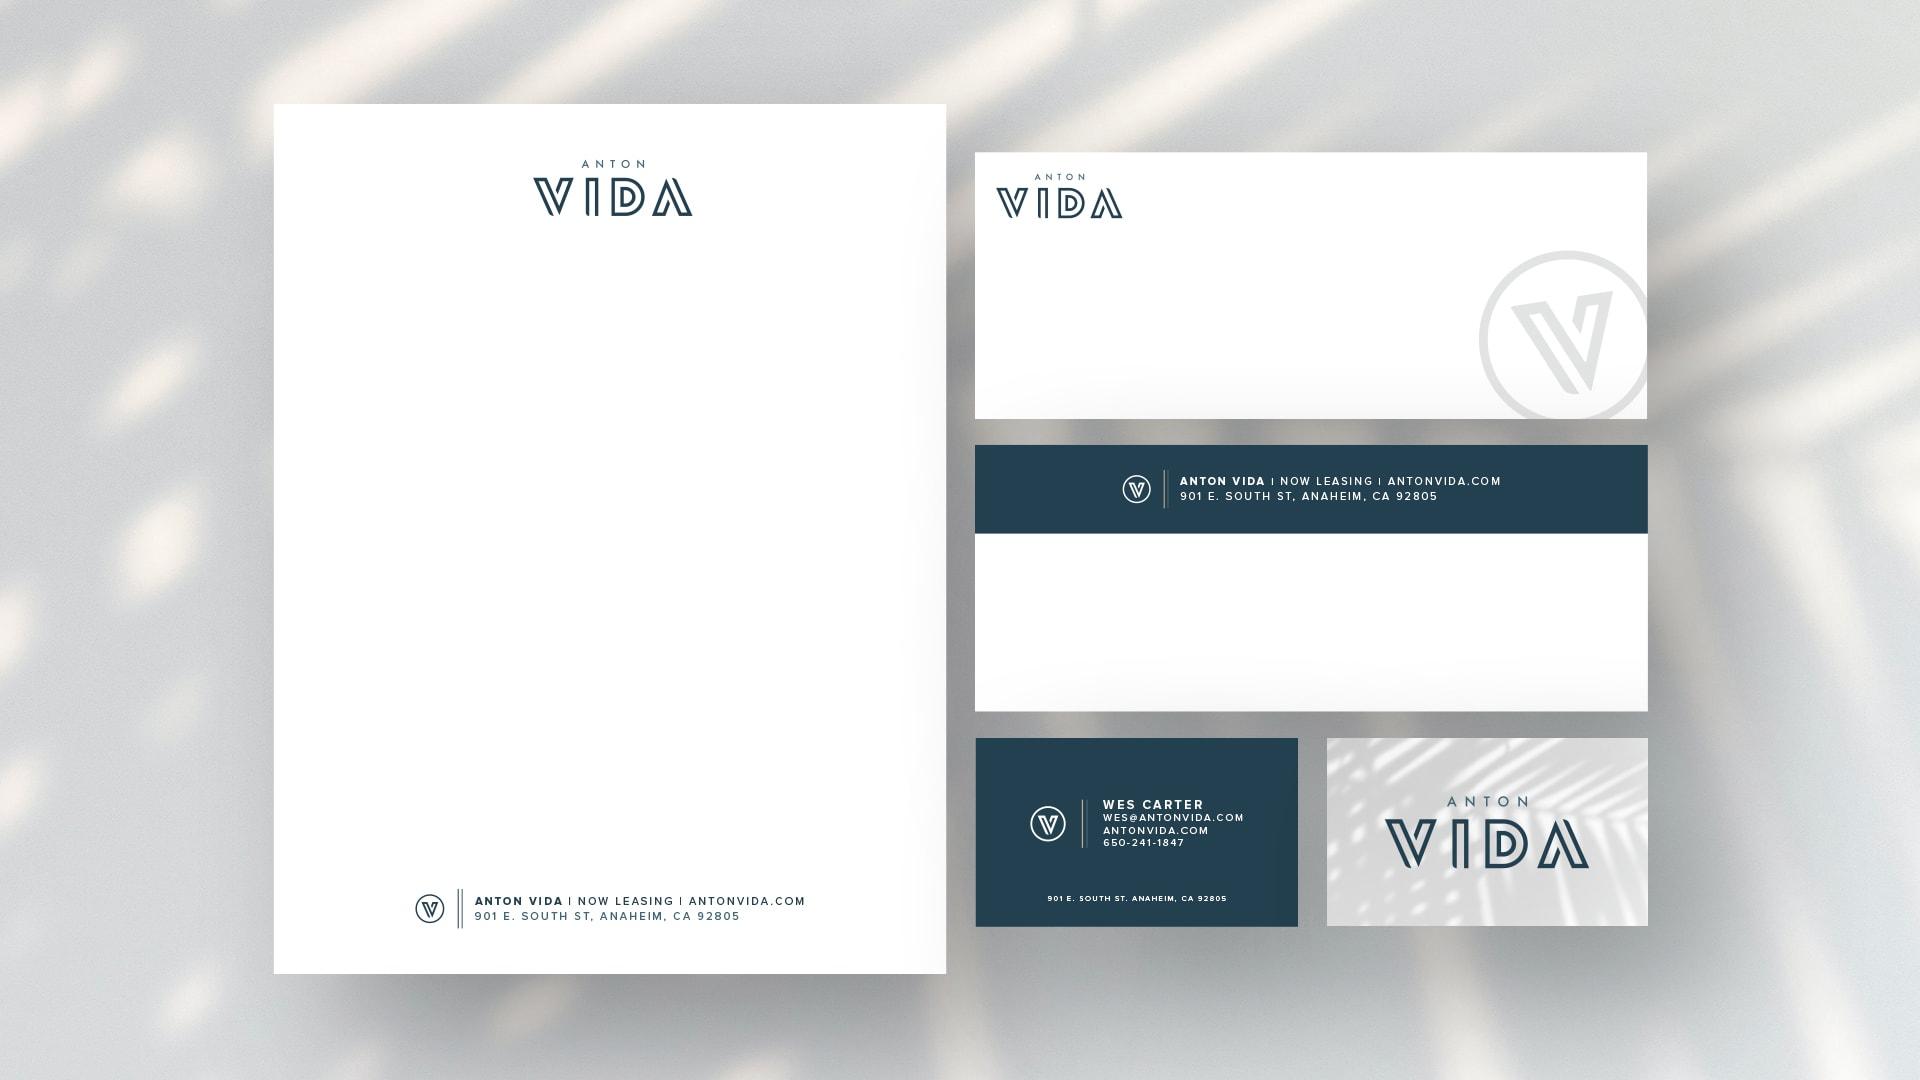 Anton Vida Stationery - Unsung Studio Branding